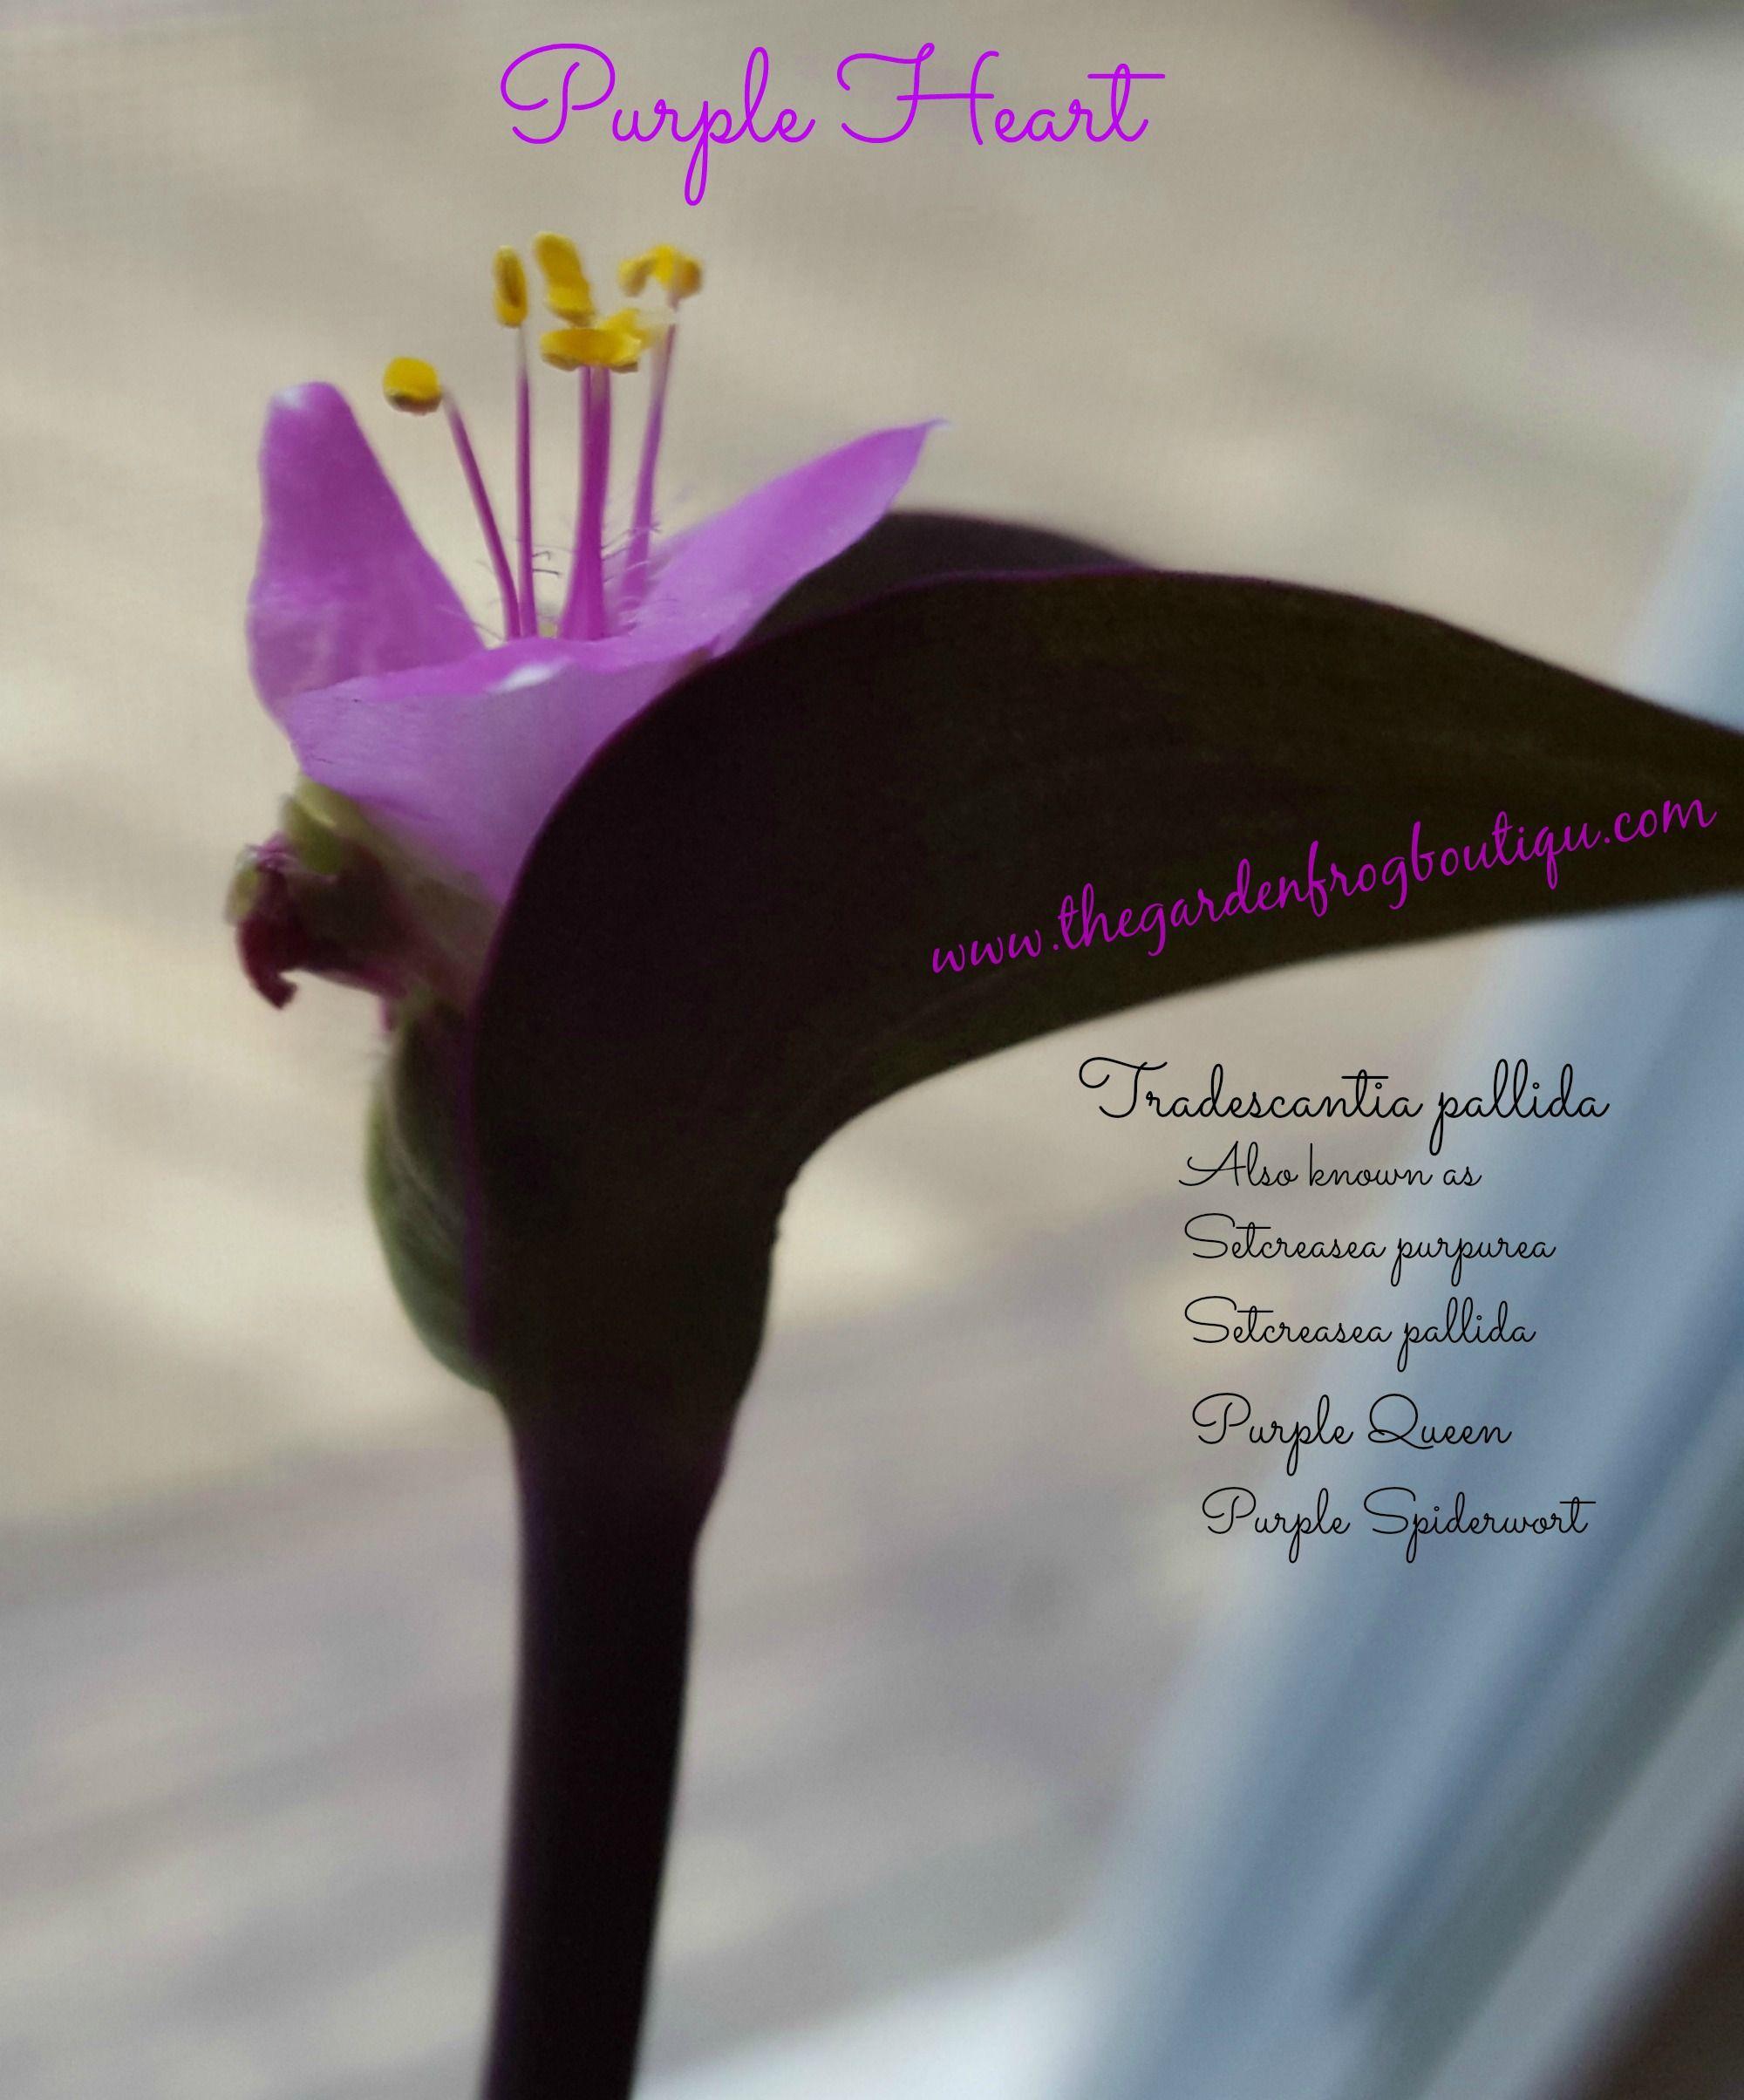 Purple Heart Tradescantia Pallida Plant The Garden Frog Boutique Purple Heart Garden Frogs Purple Heart Plant